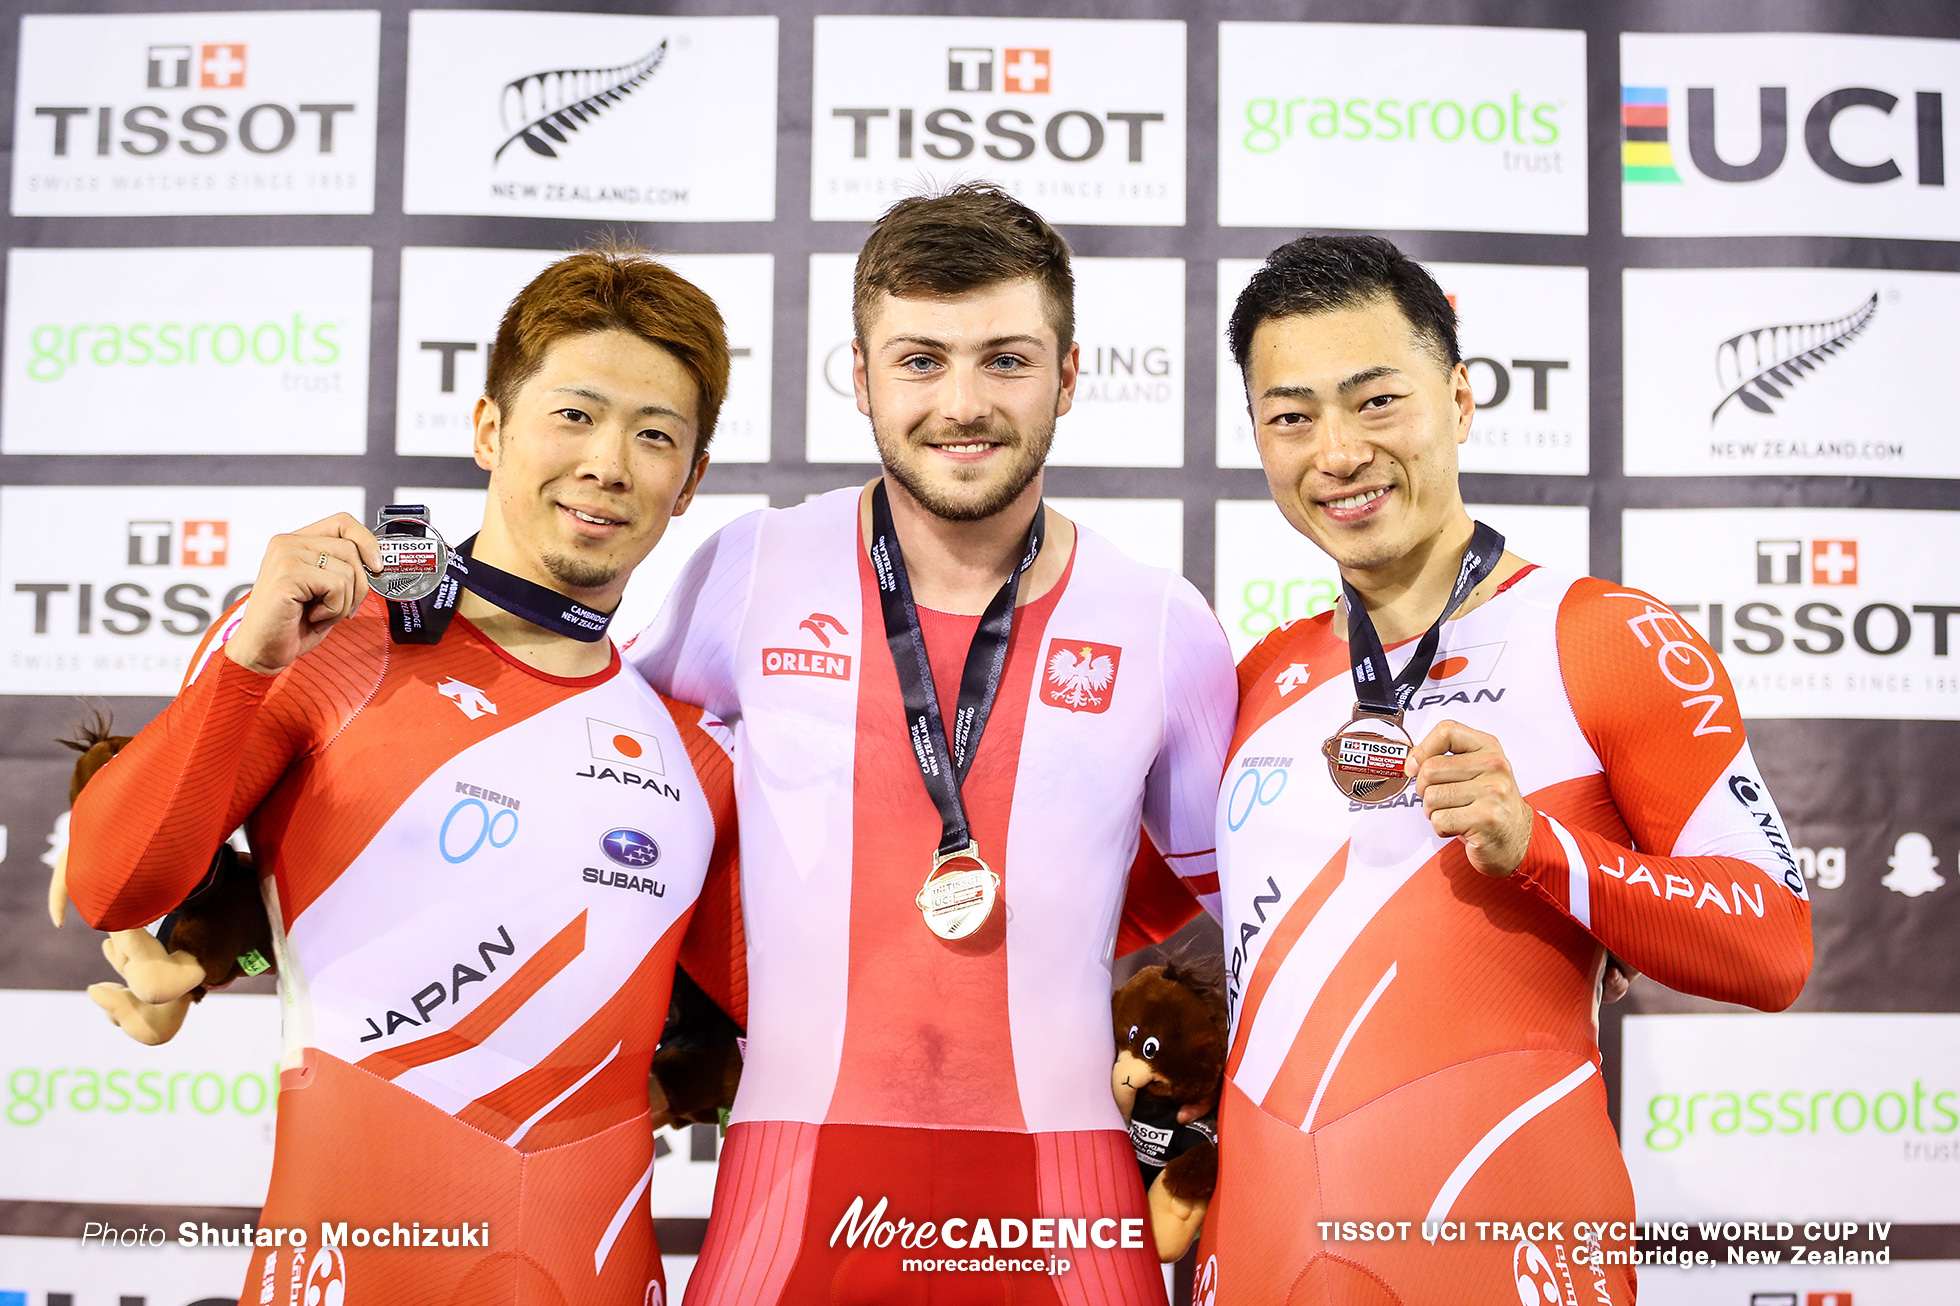 Final / Men's Sprint / TISSOT UCI TRACK CYCLING WORLD CUP IV, Cambridge, New Zealand, Mateusz Rudyk マテウス・ルディク 深谷知広 新田祐大